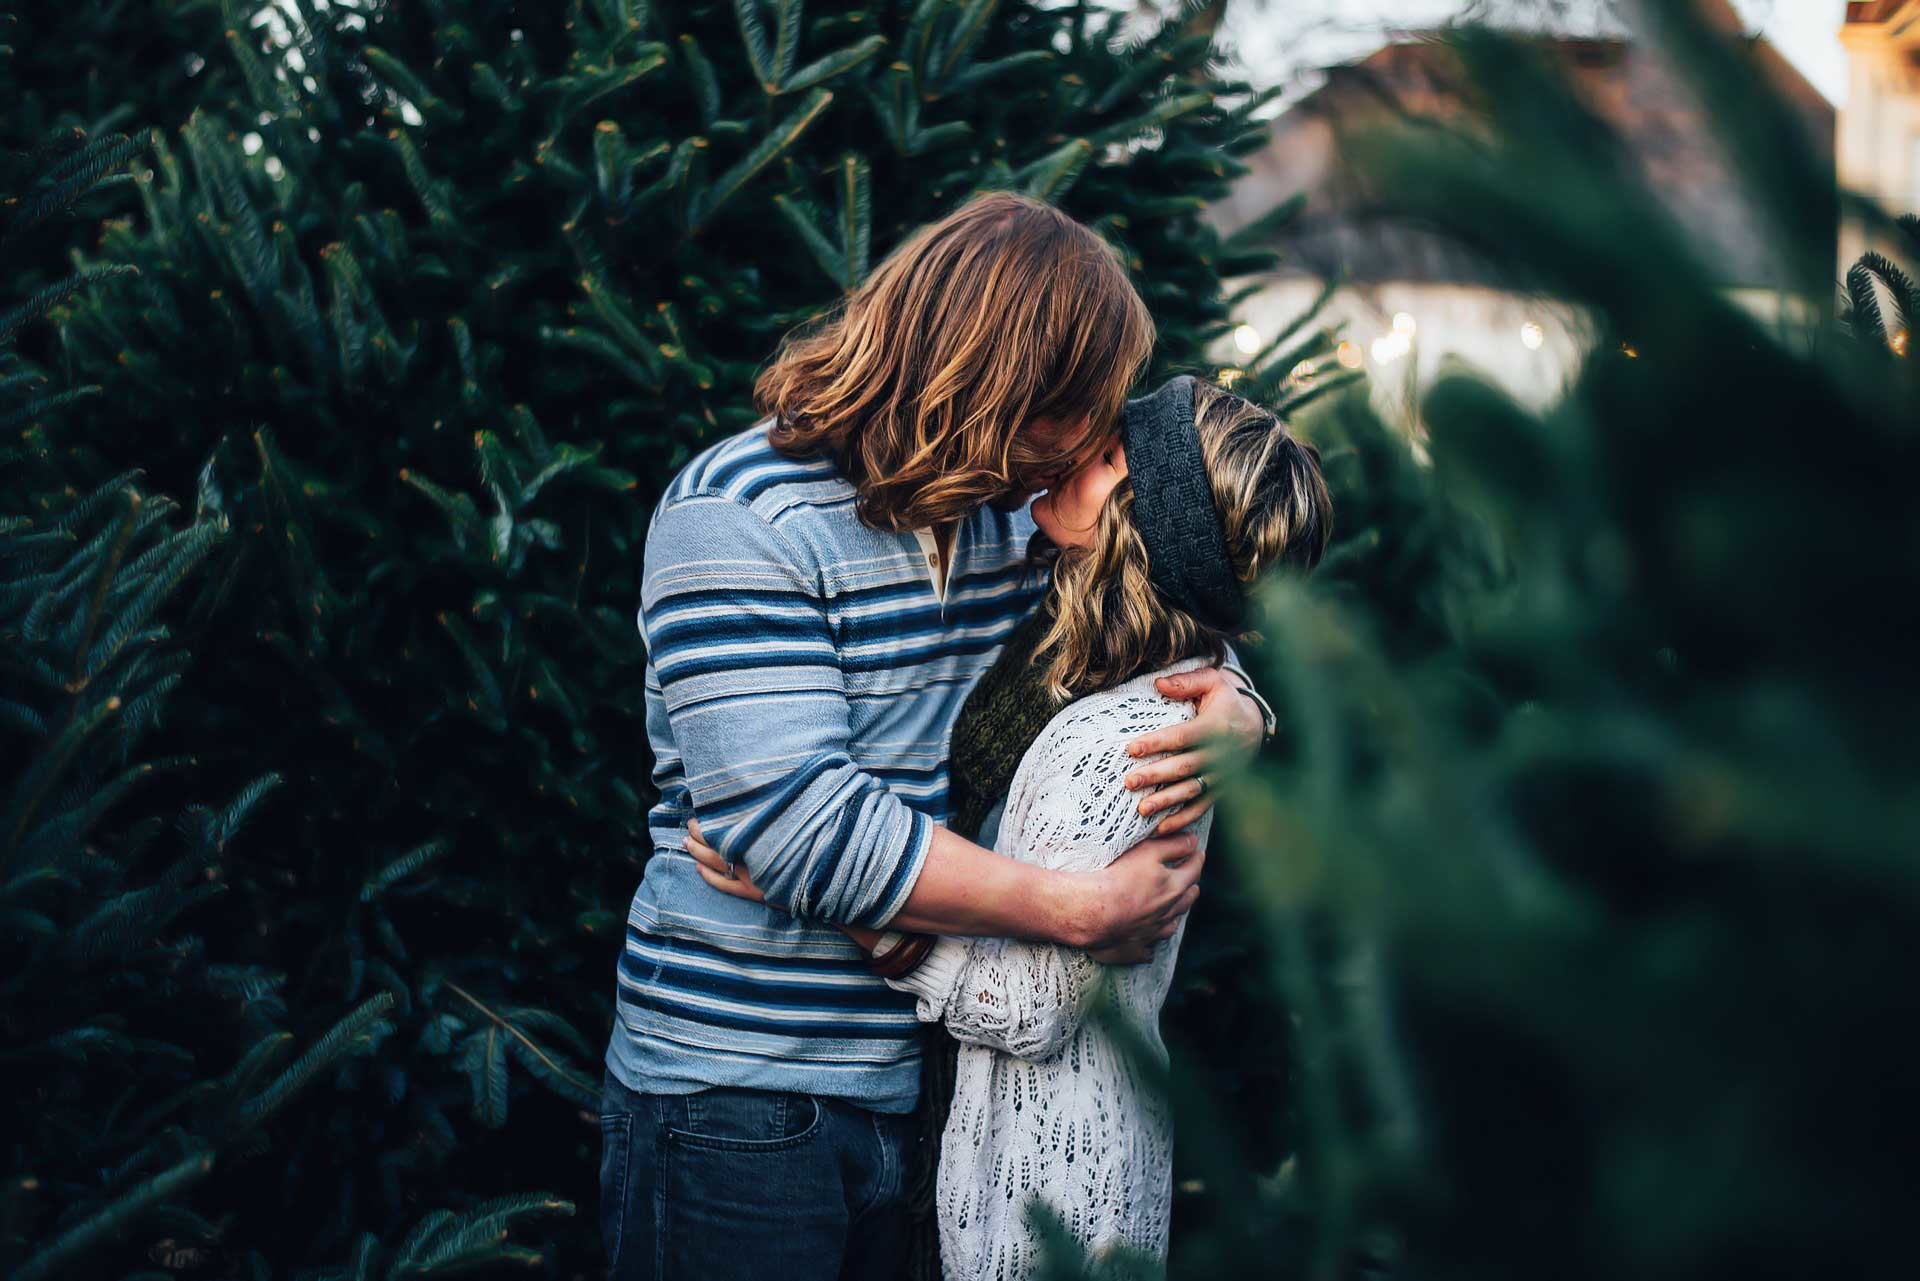 1920x1200 Romantic Couple Kissing In Garden Love HD Wallpaper Couples